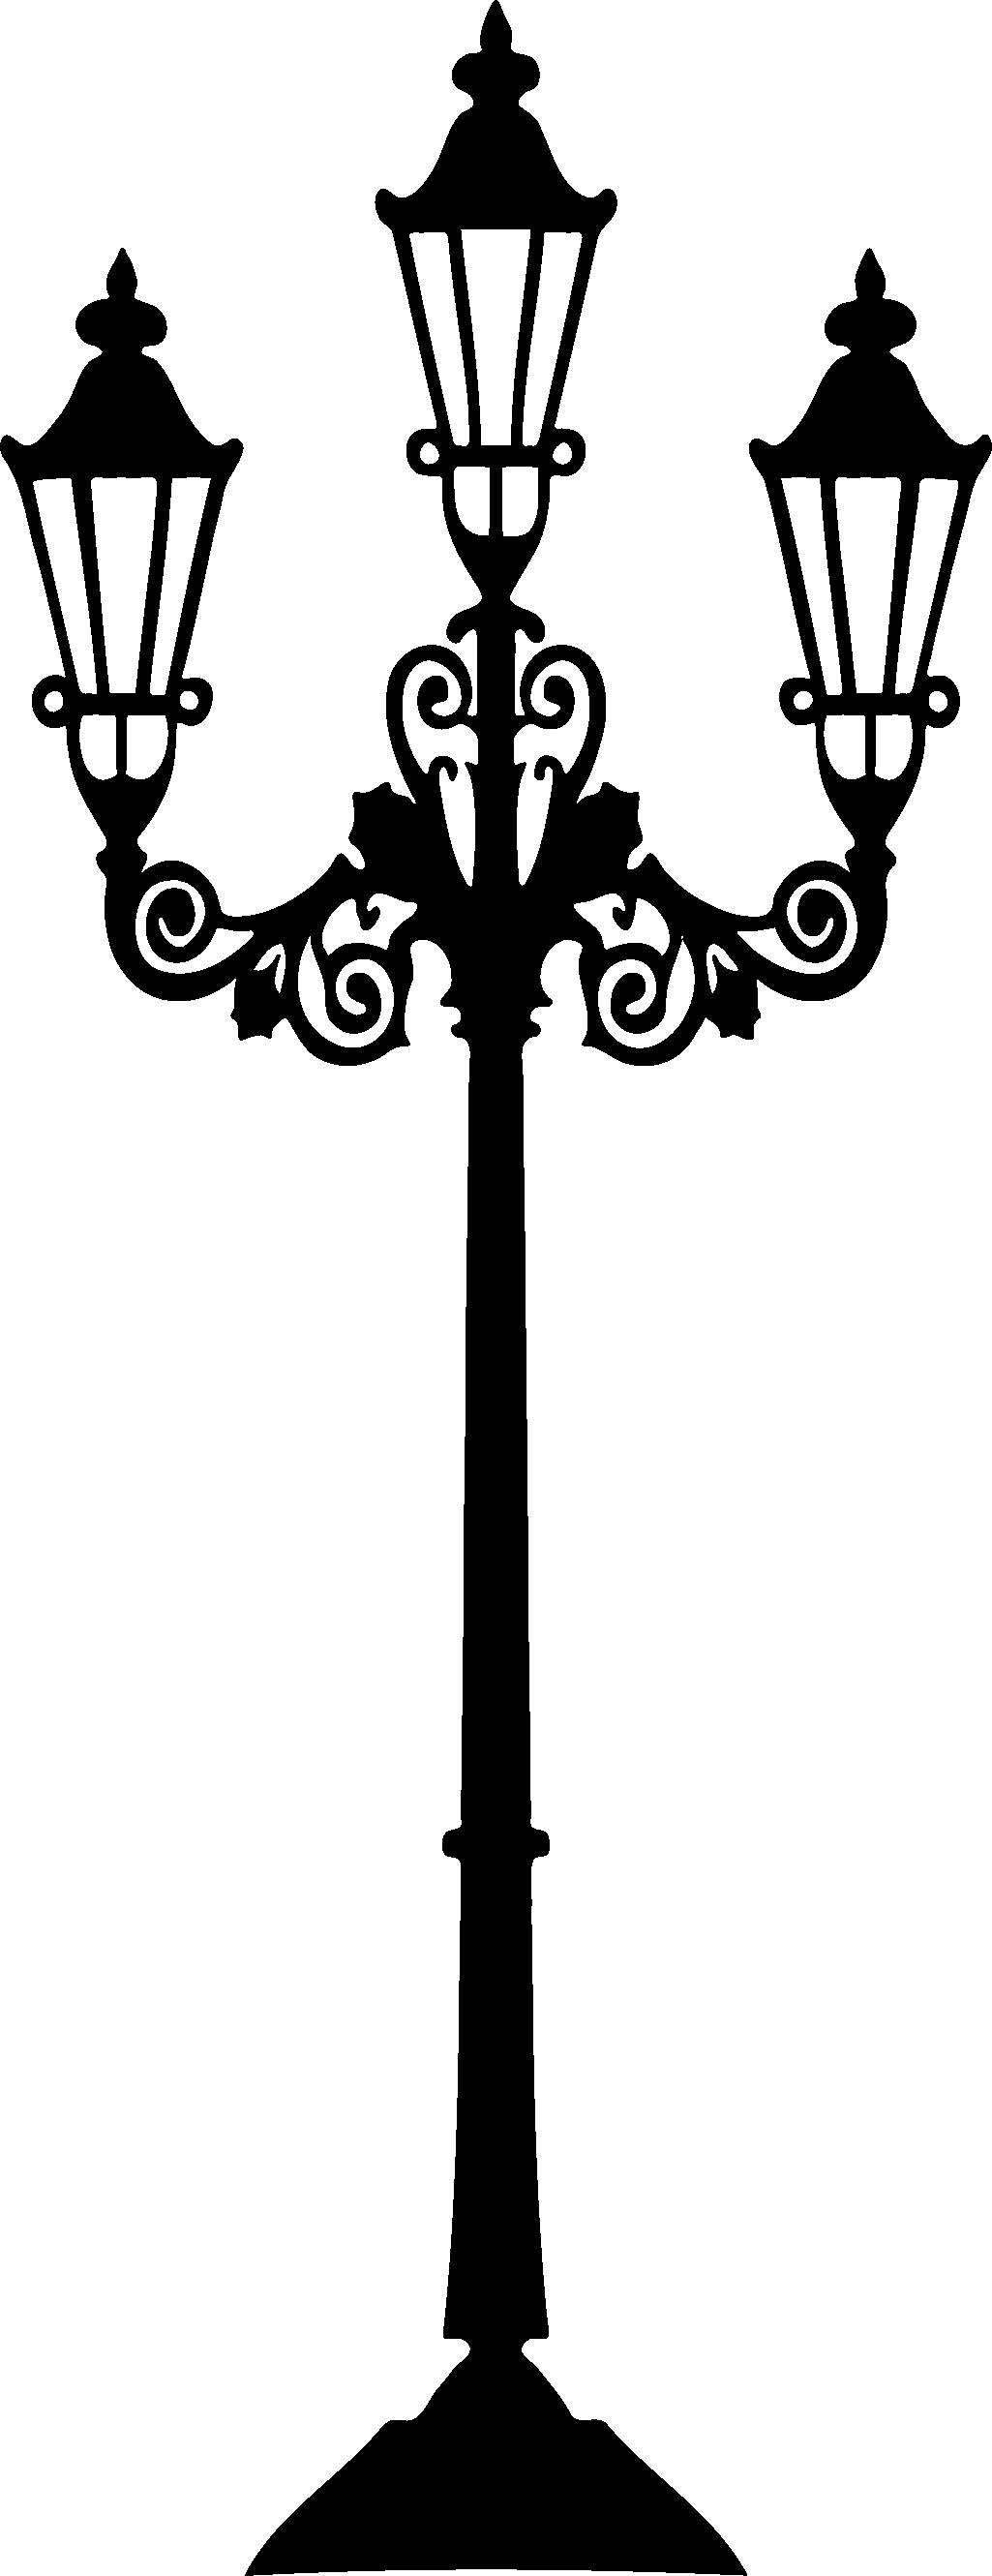 Lamp clipart sound light. Google image result for